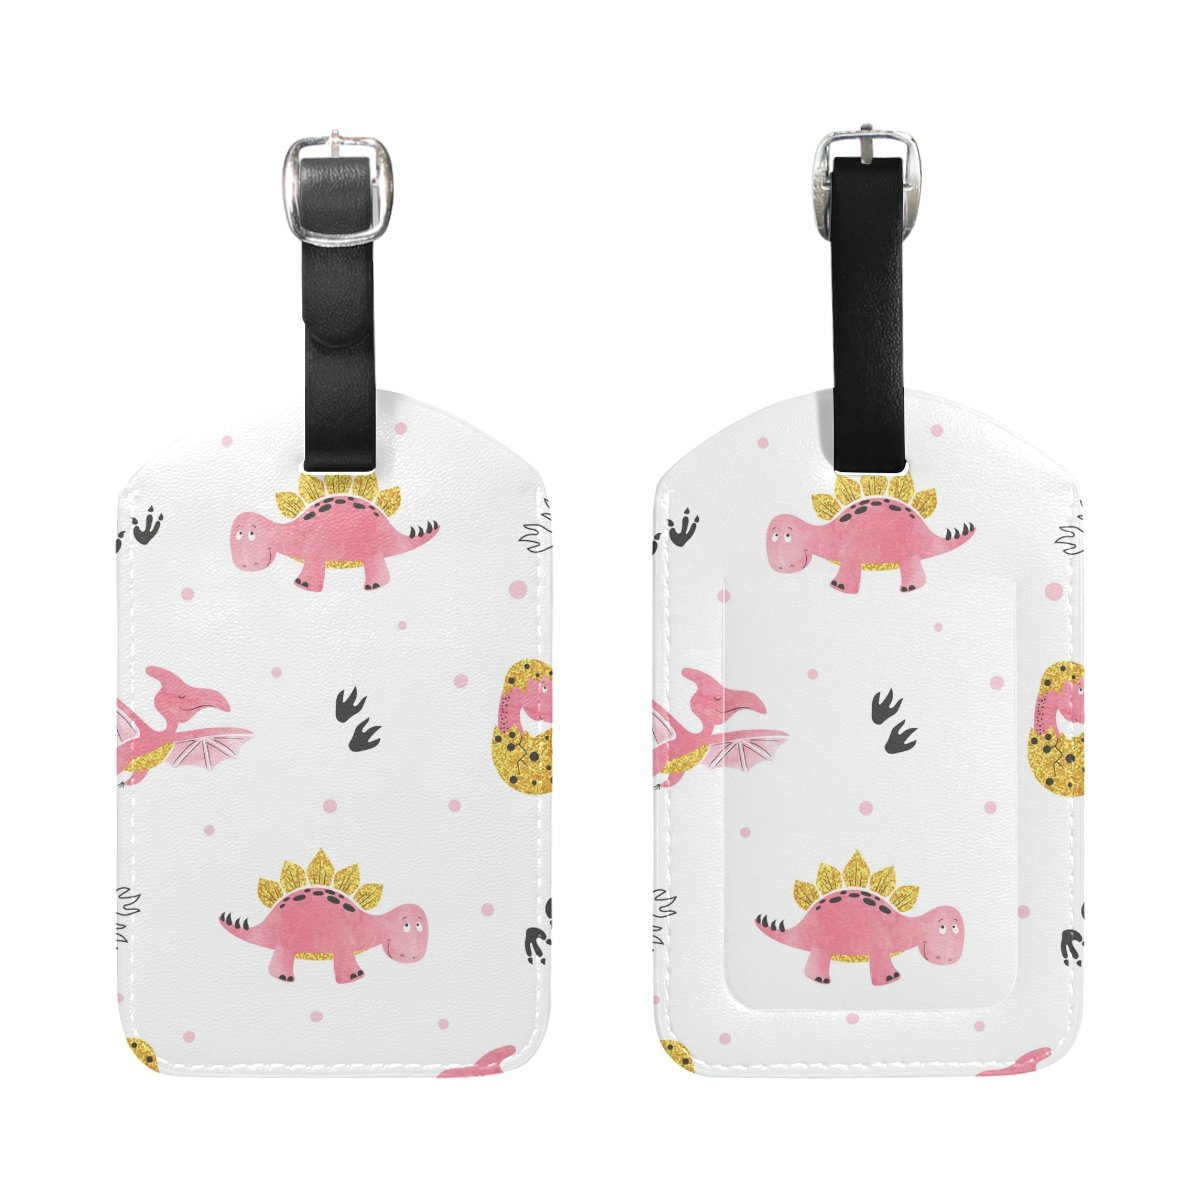 Saobao Travel Luggage Tag Cute Cartoon Dinosaurs PU Leather Baggage Suitcase Travel ID Bag Tag 1Pcs